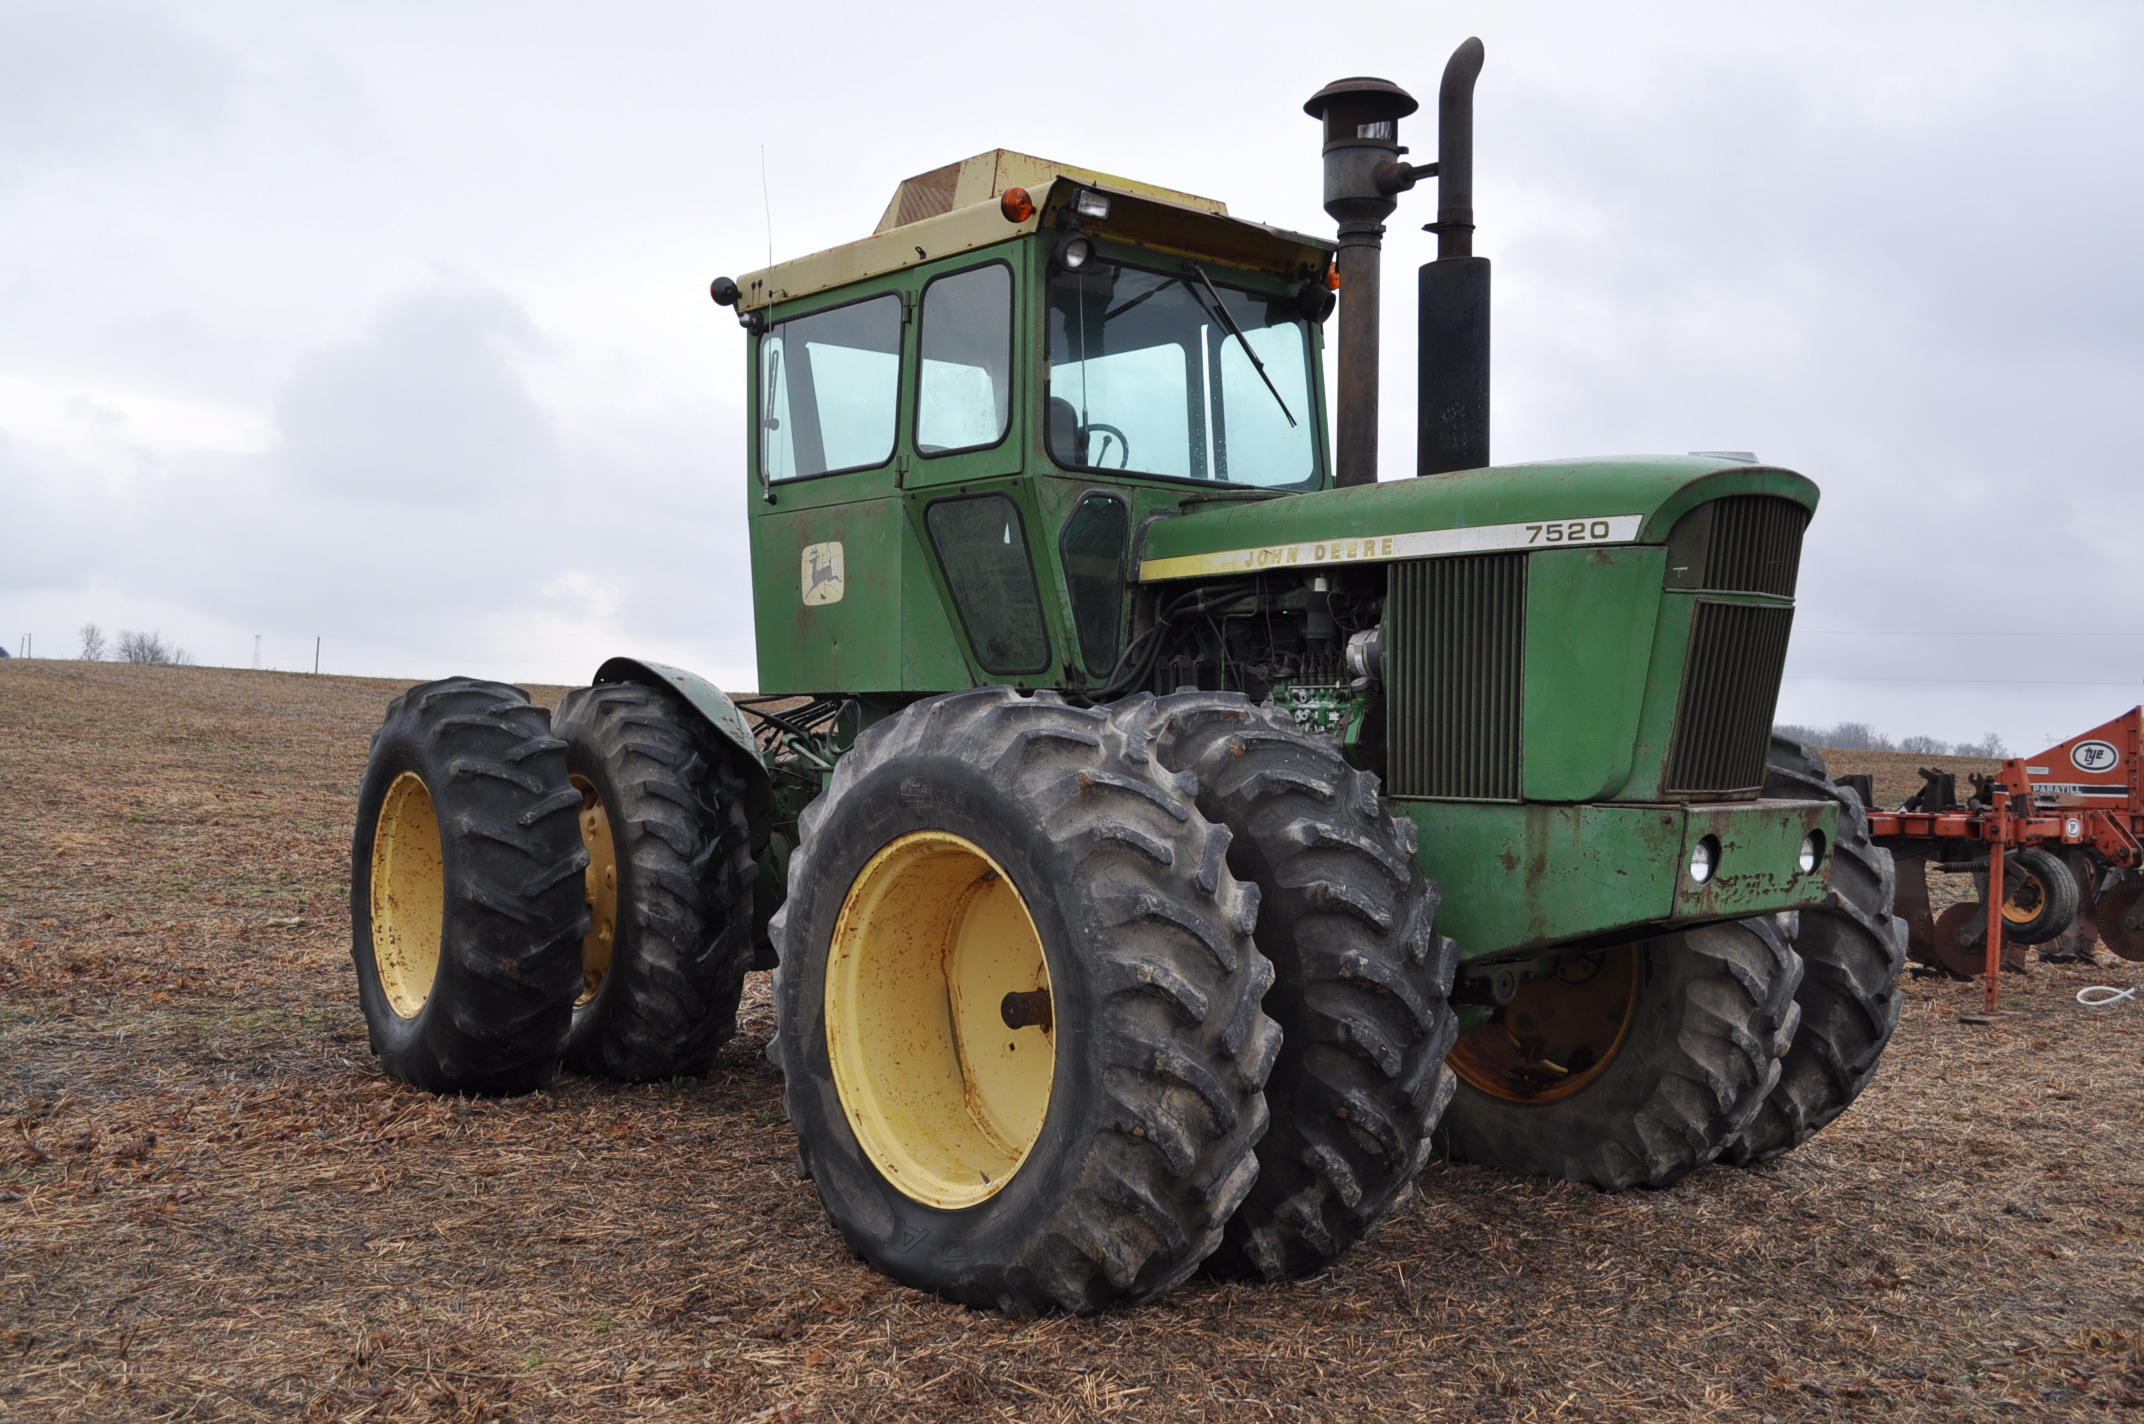 John Deere 7520 tractor, 4WD, diesel, 18.4-34 duals, original fenders, CHA, cab interior kit, 3 - Image 4 of 24